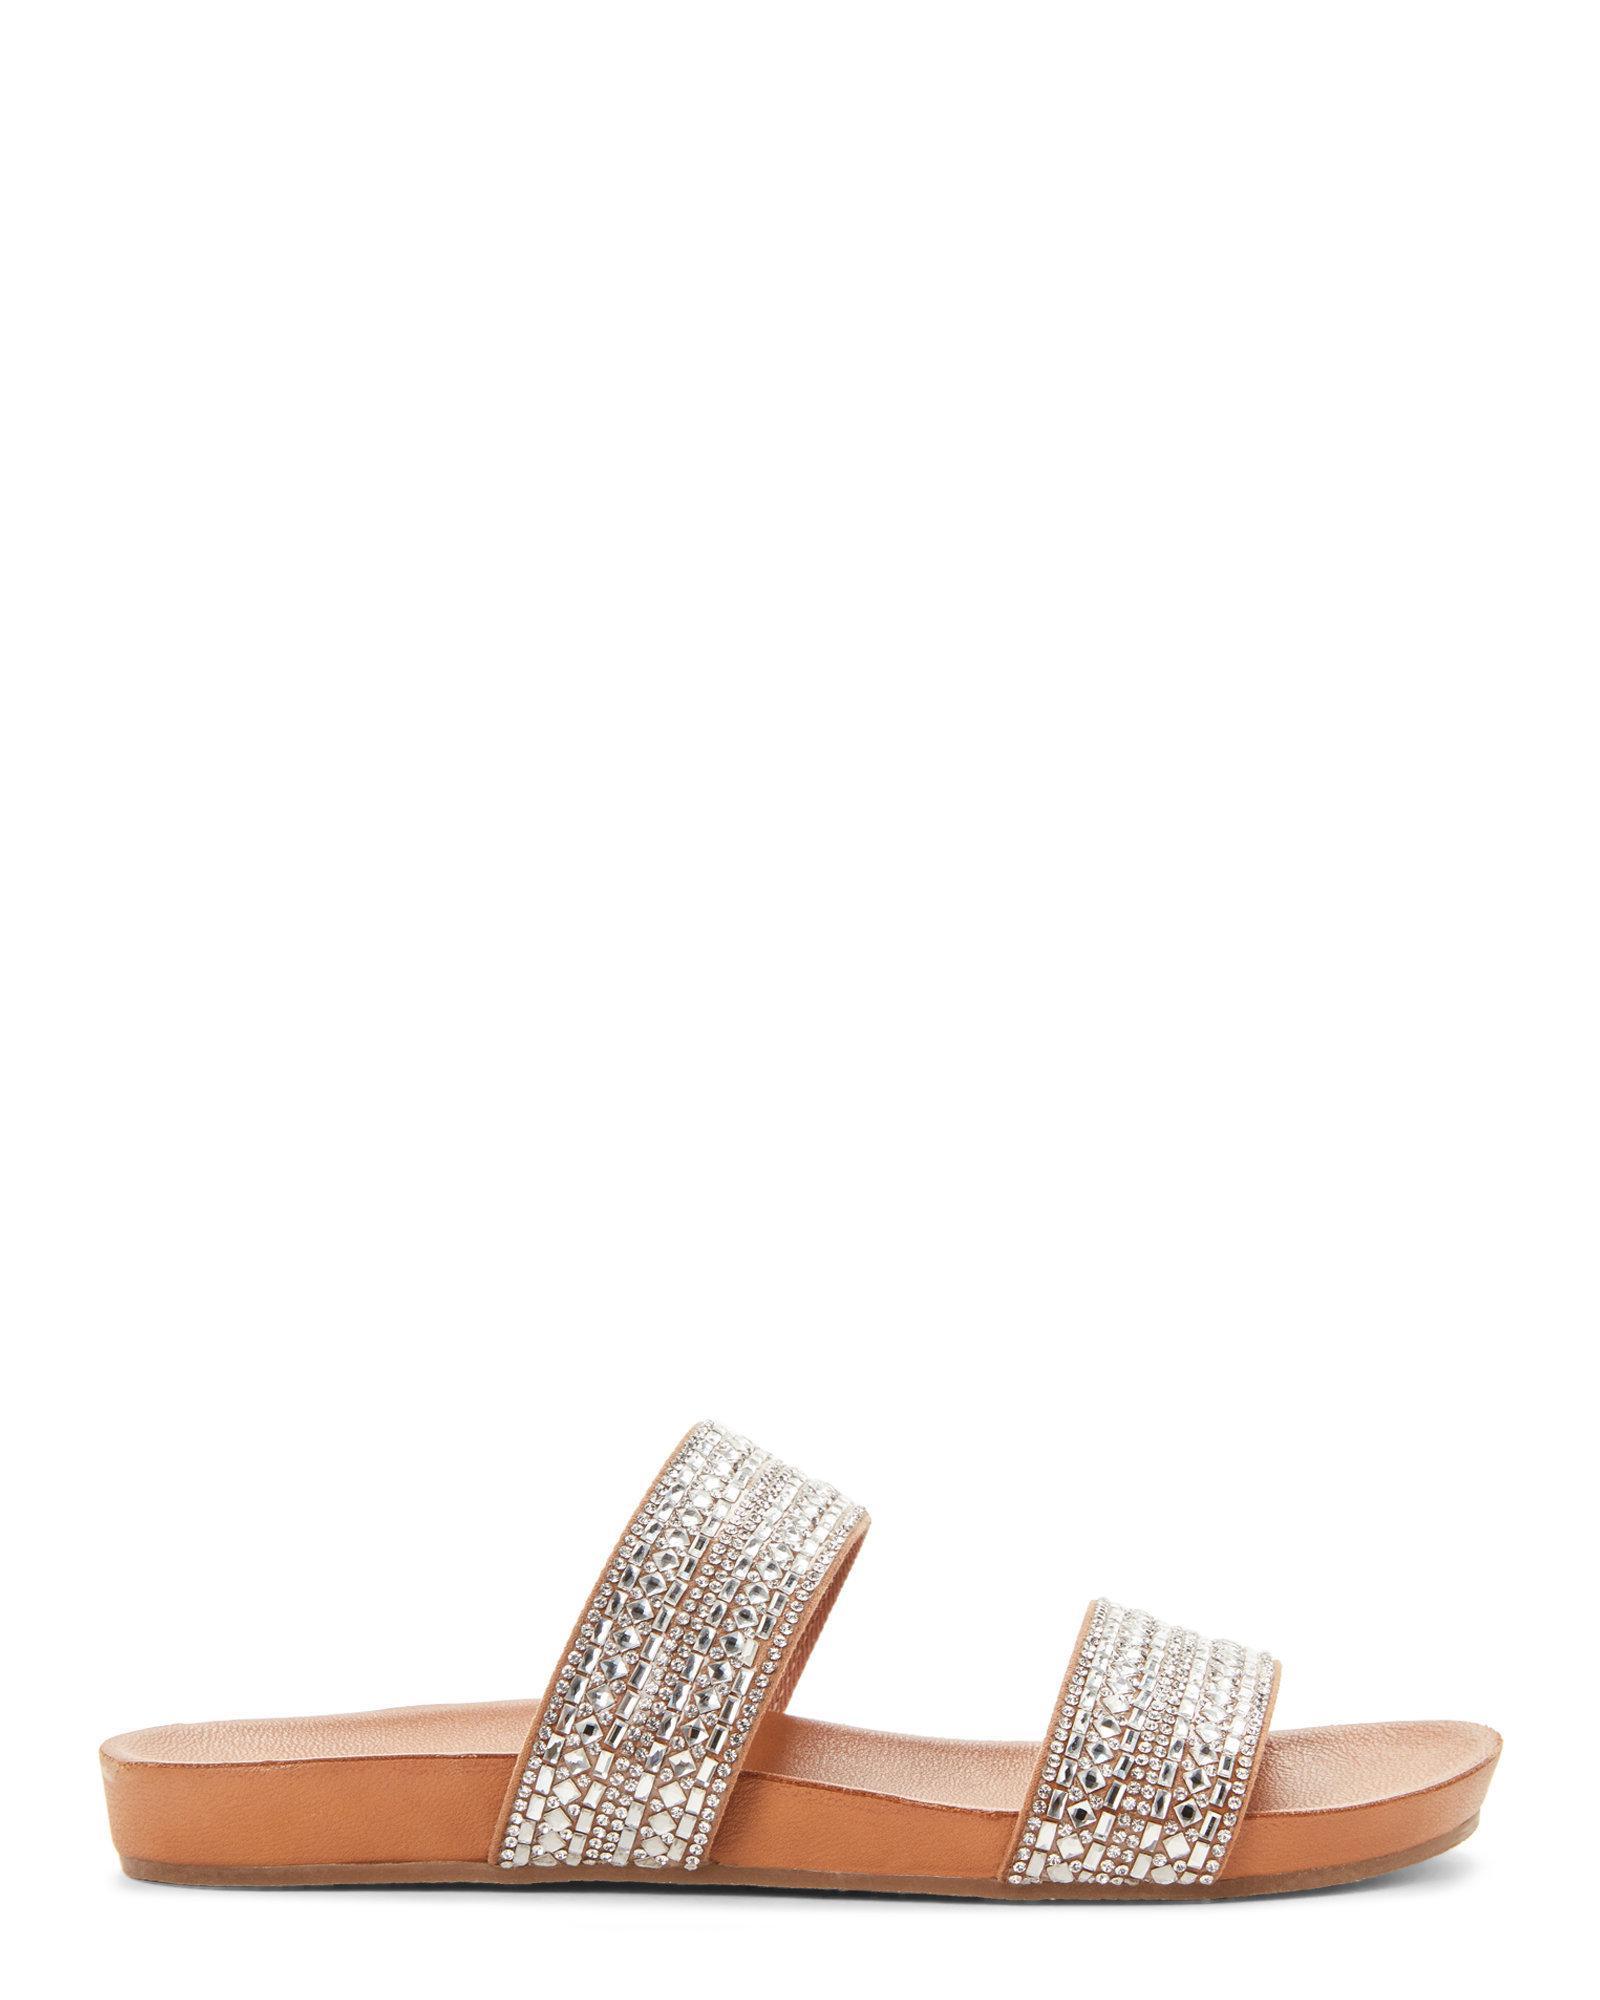 a38ab789637 Lyst - Steve Madden Rhinestone Dynamo Double Band Slide Sandals